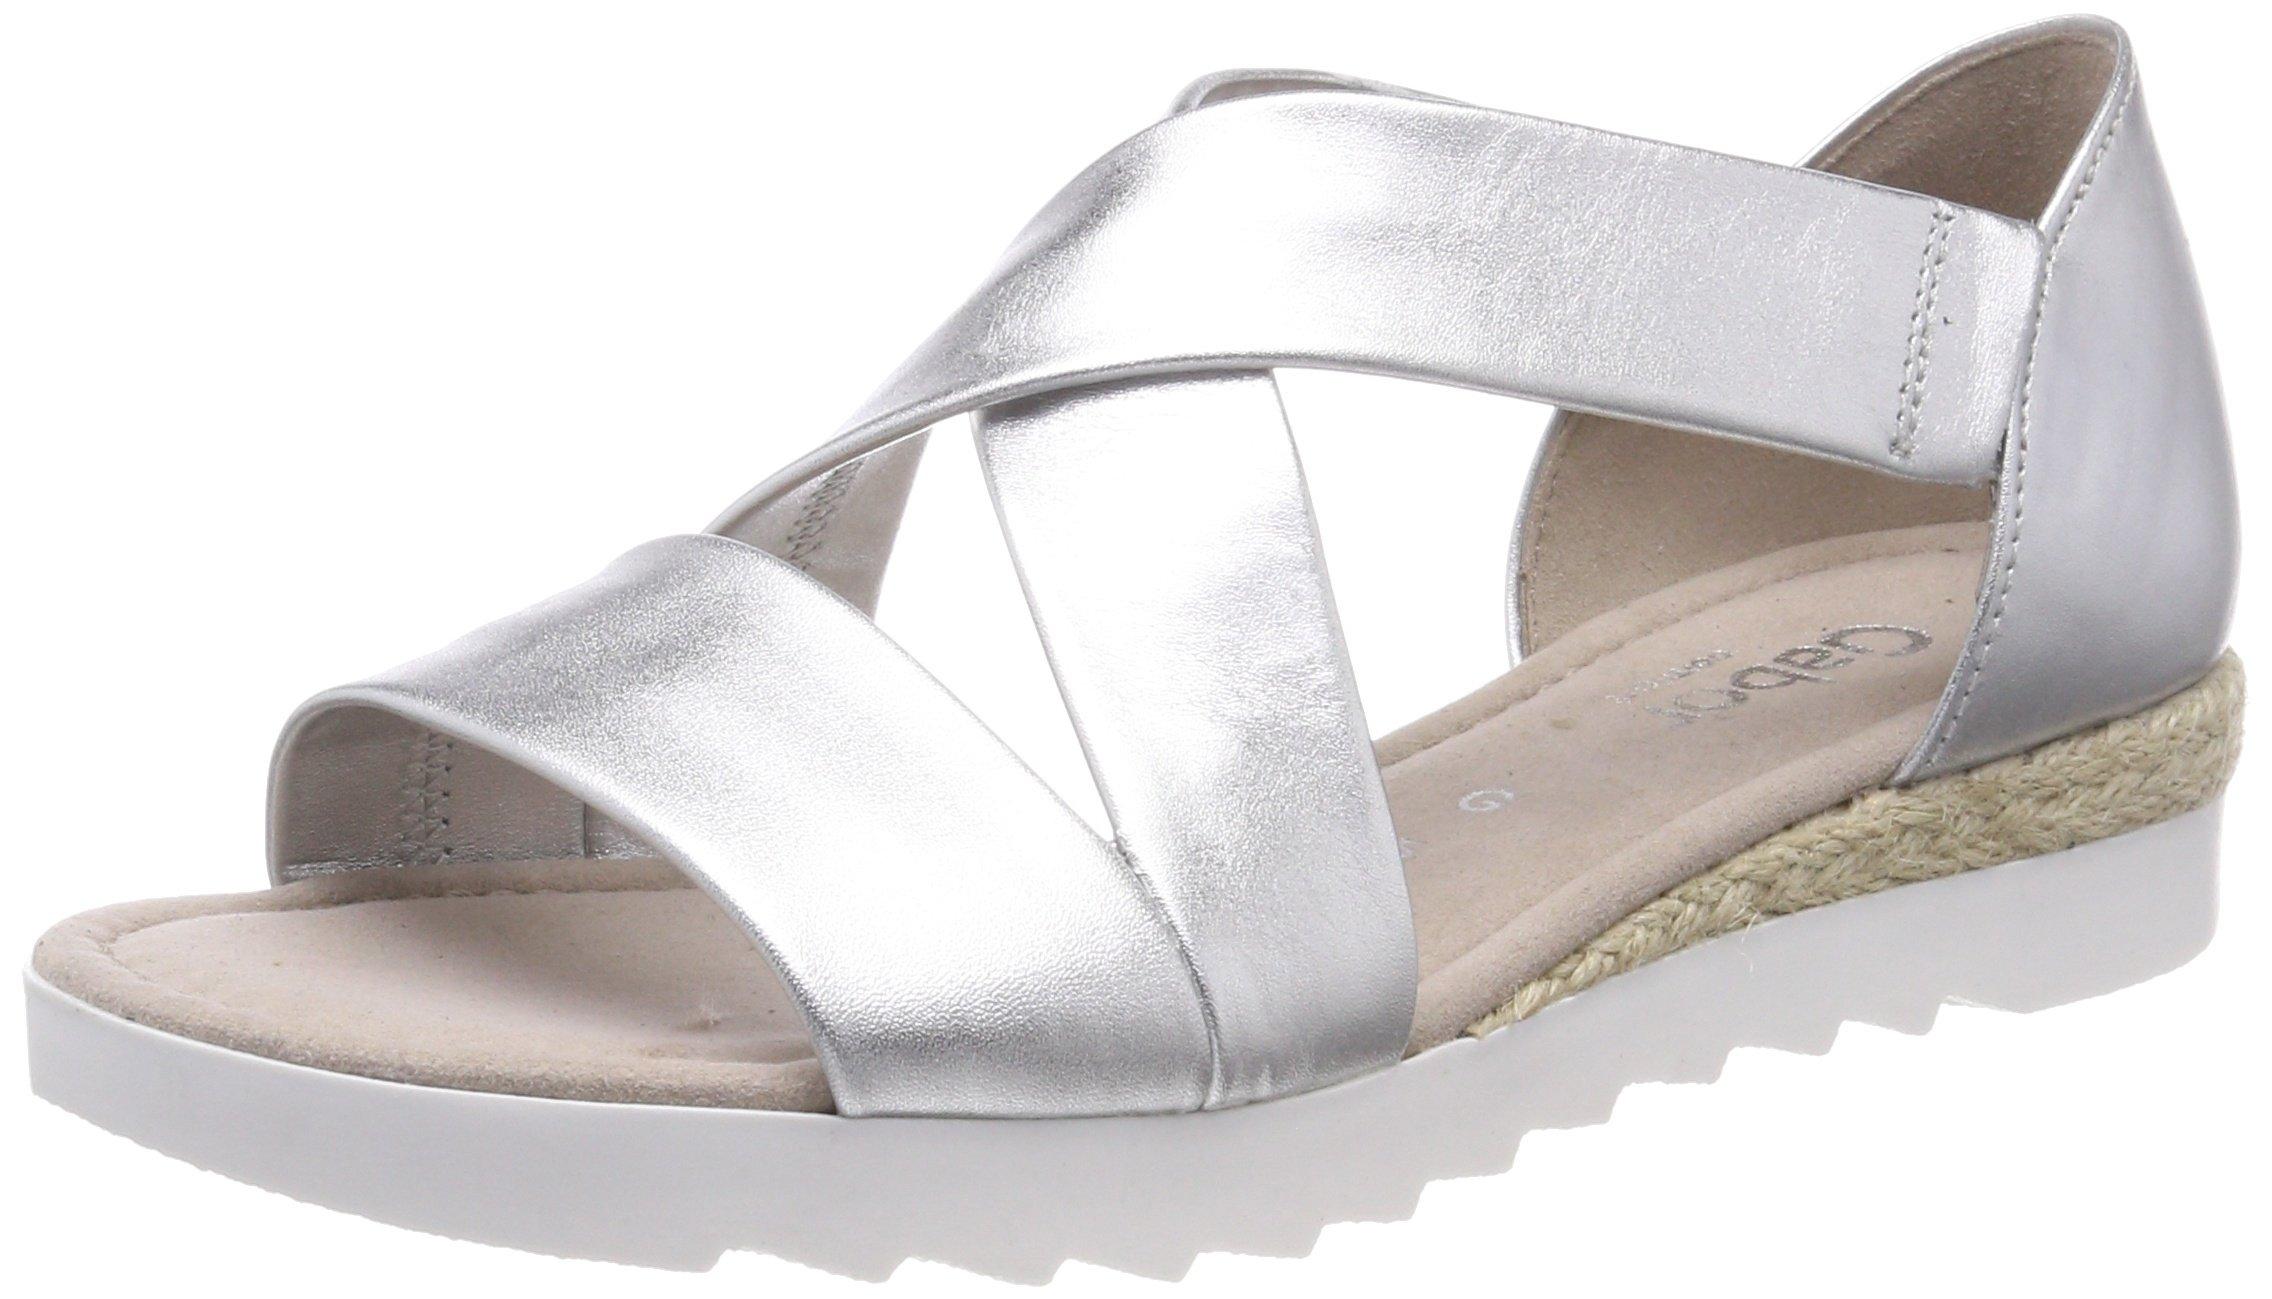 Gabor Jute42 FemmeMulticoloresilber 5 Shoes Comfort Cheville Eu Bride SportSandales CxeWroBd